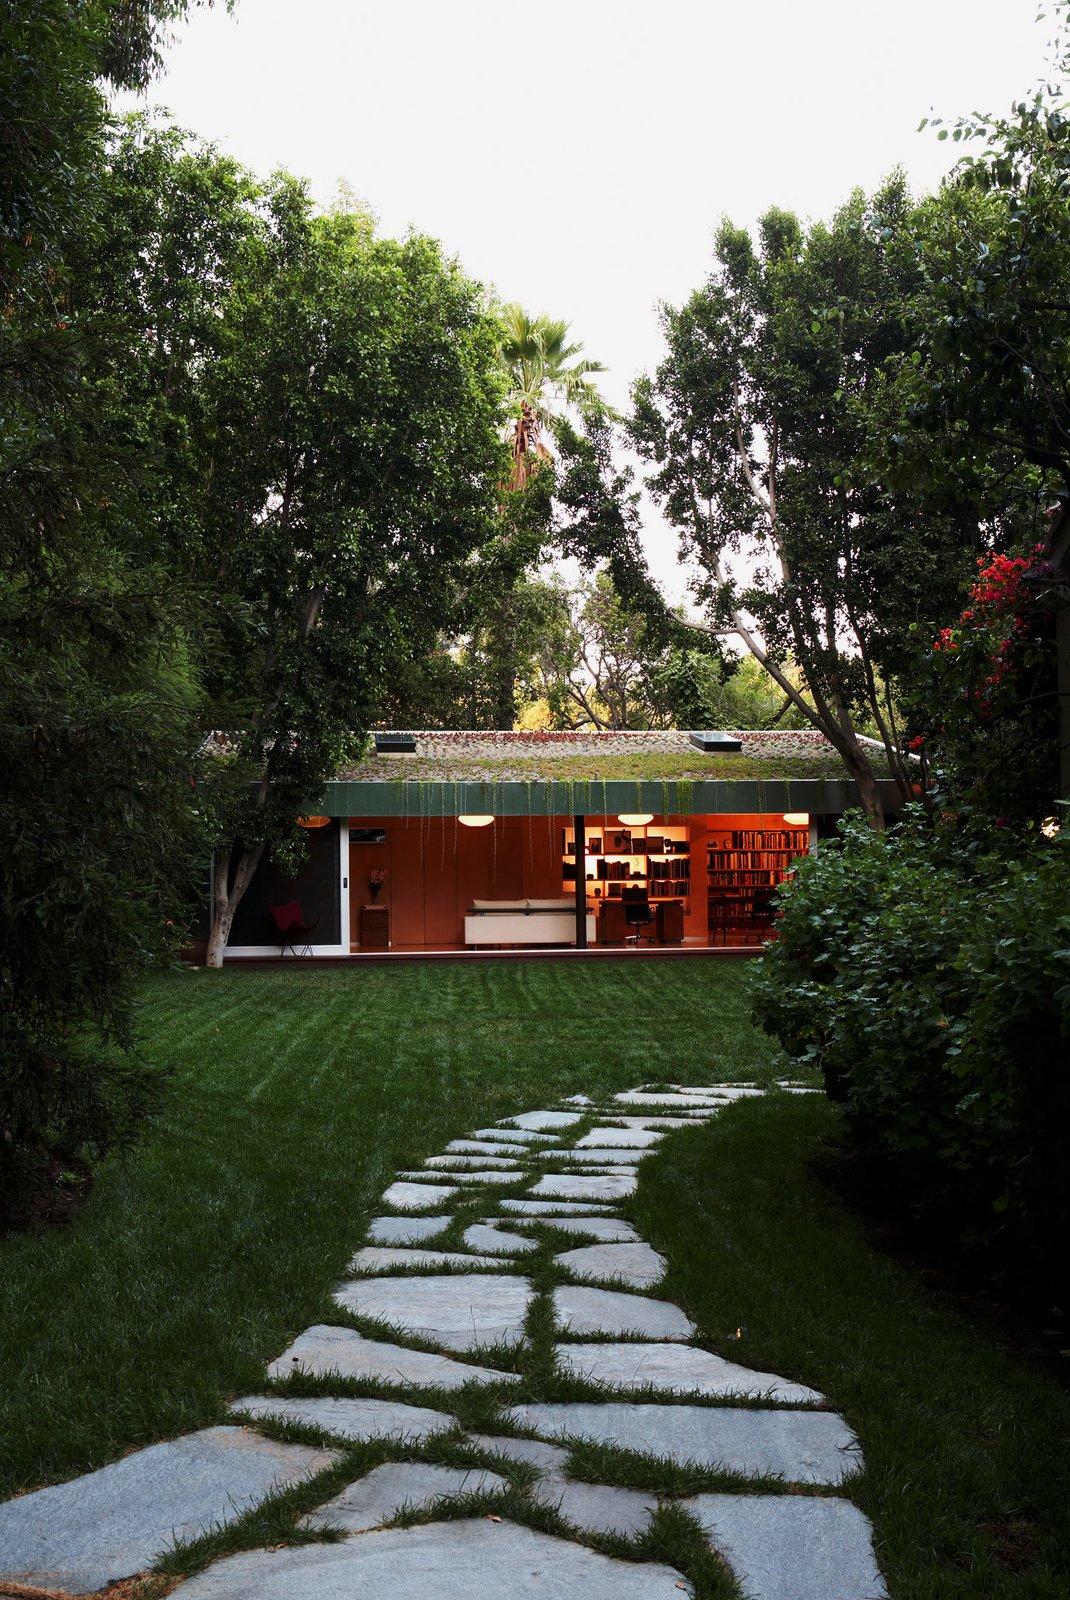 #LushHouse #modern #midcentury #hillside #seclusion #lighting #exterior #outside #landscape #pathway #plants #trees #BeverlyHills #KingsleyStephensonArchitecture  Lush House